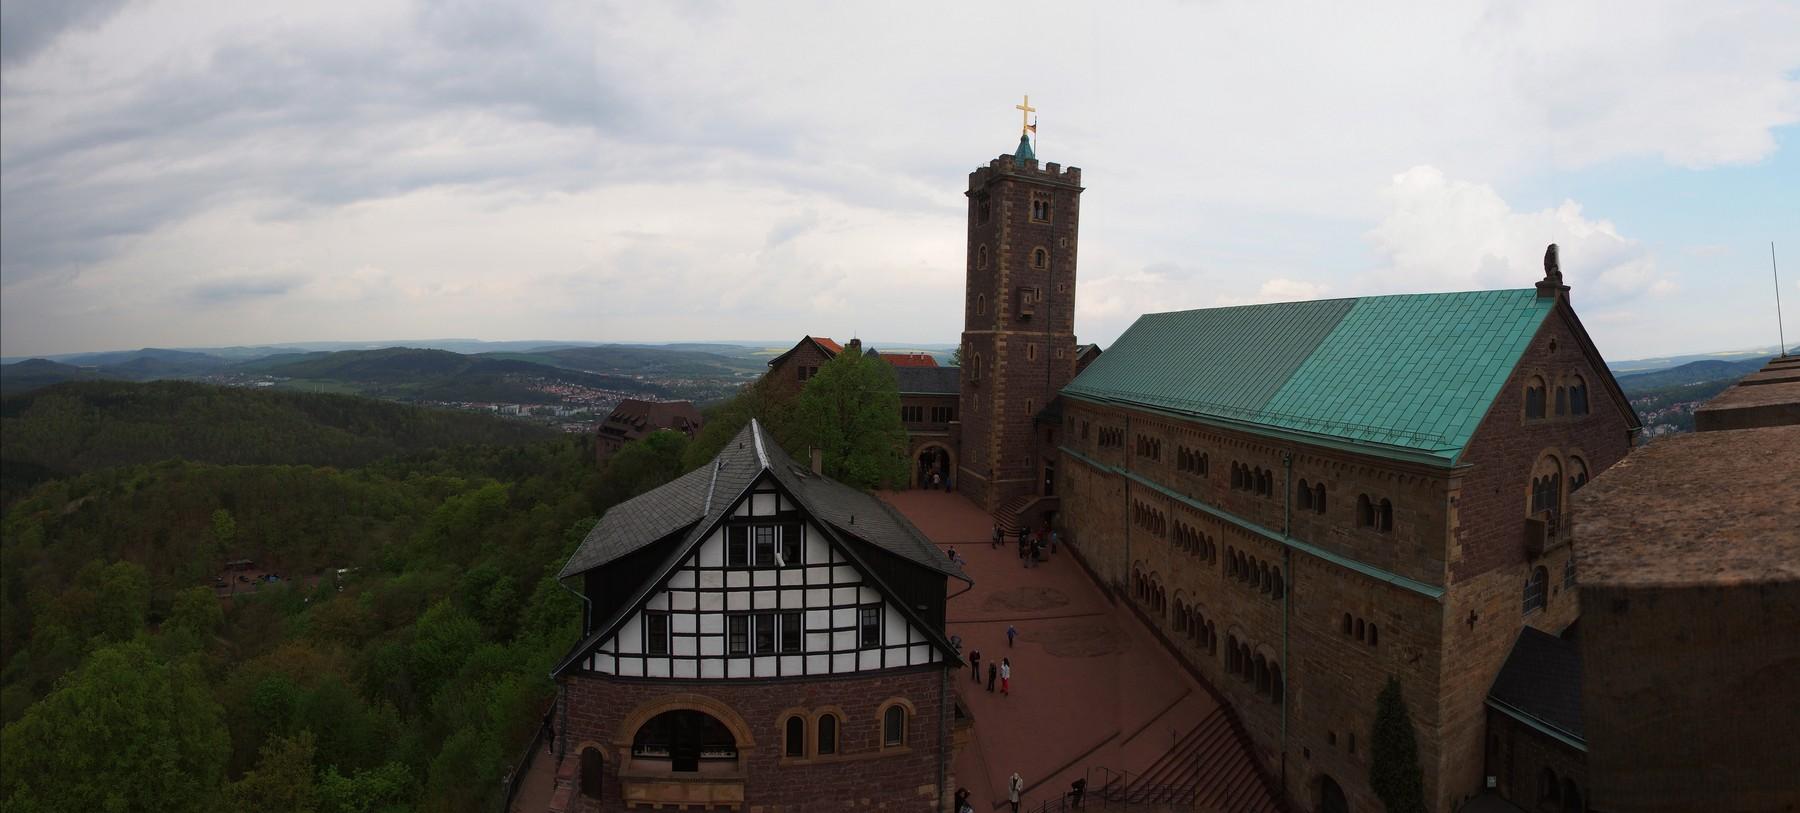 P4217894 Pano Castillo de Wartburg Unesco Alemania